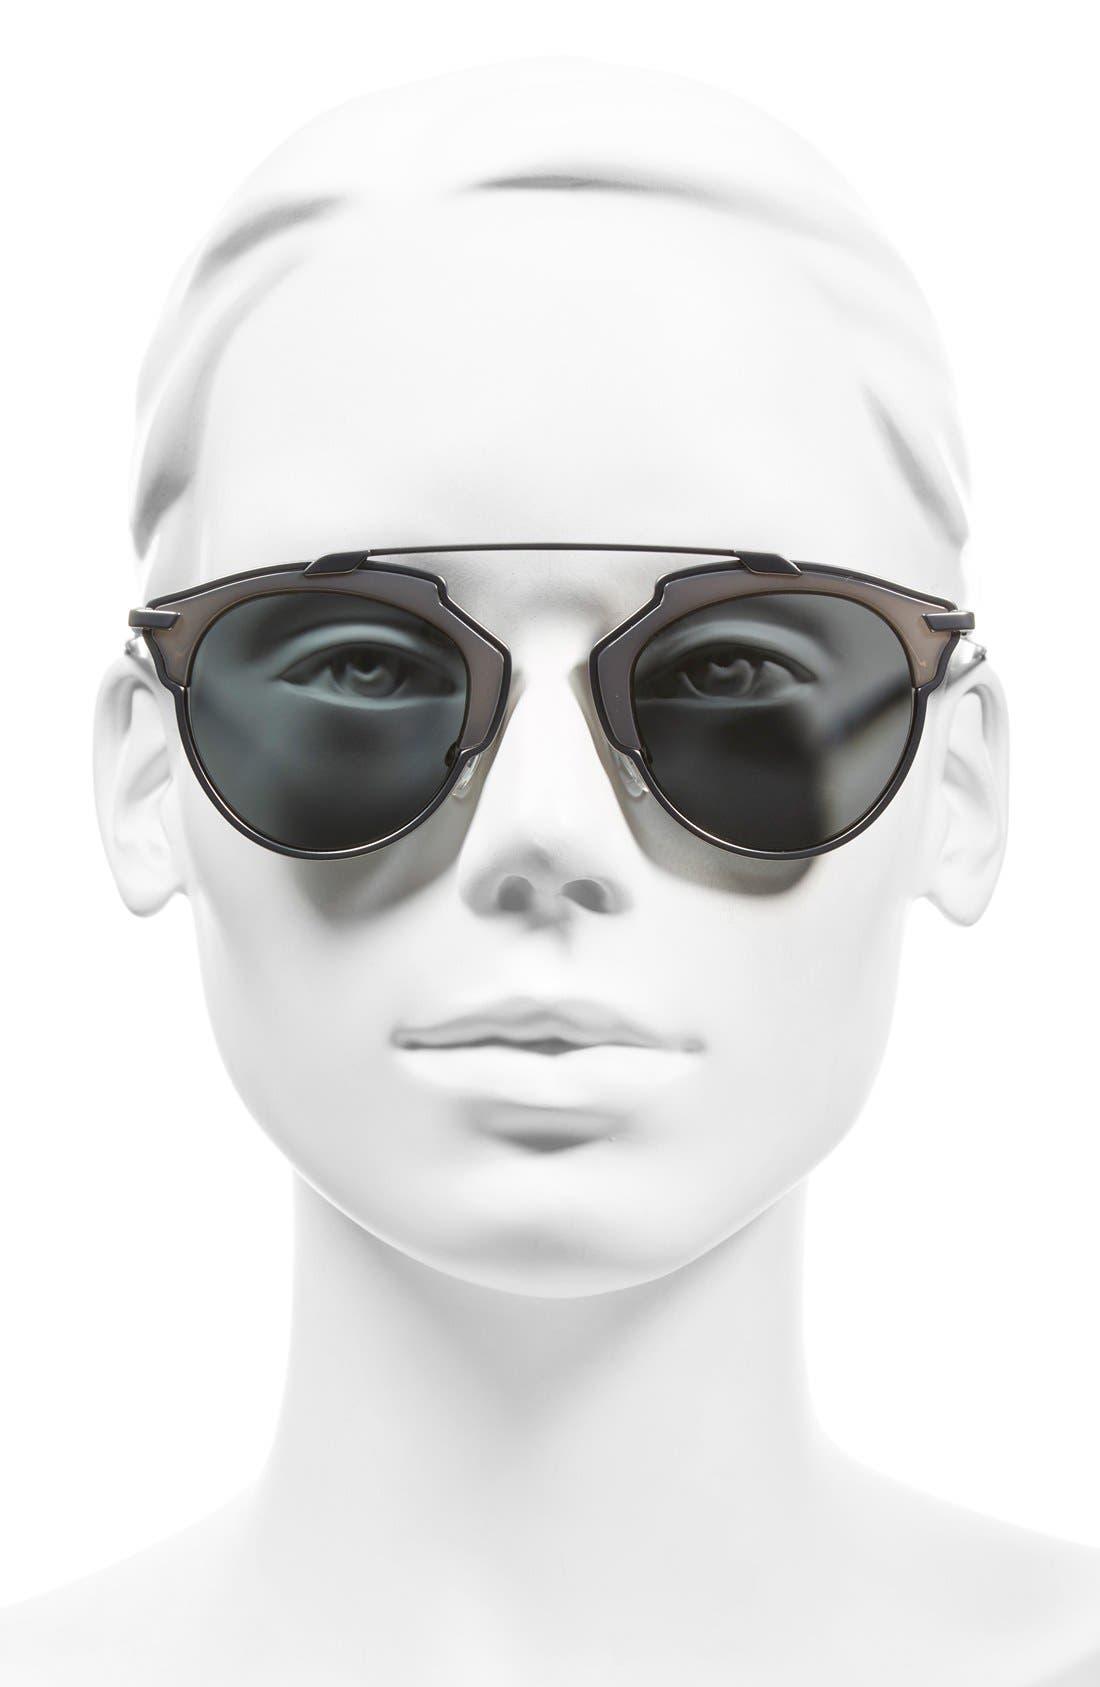 So Real 48mm Brow Bar Sunglasses,                             Alternate thumbnail 39, color,